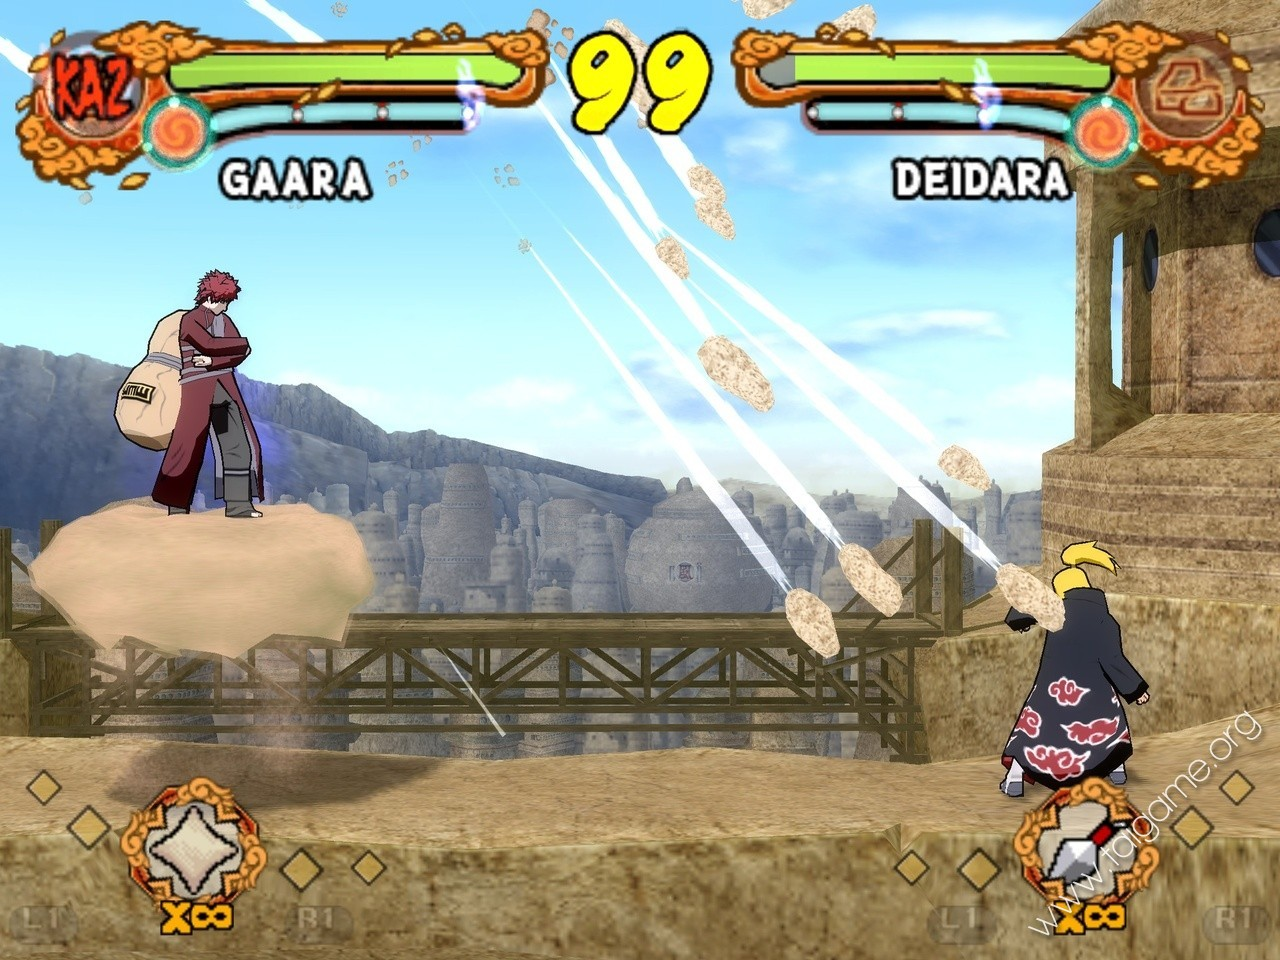 Naruto shippuden: ultimate ninja 5 download free full games.